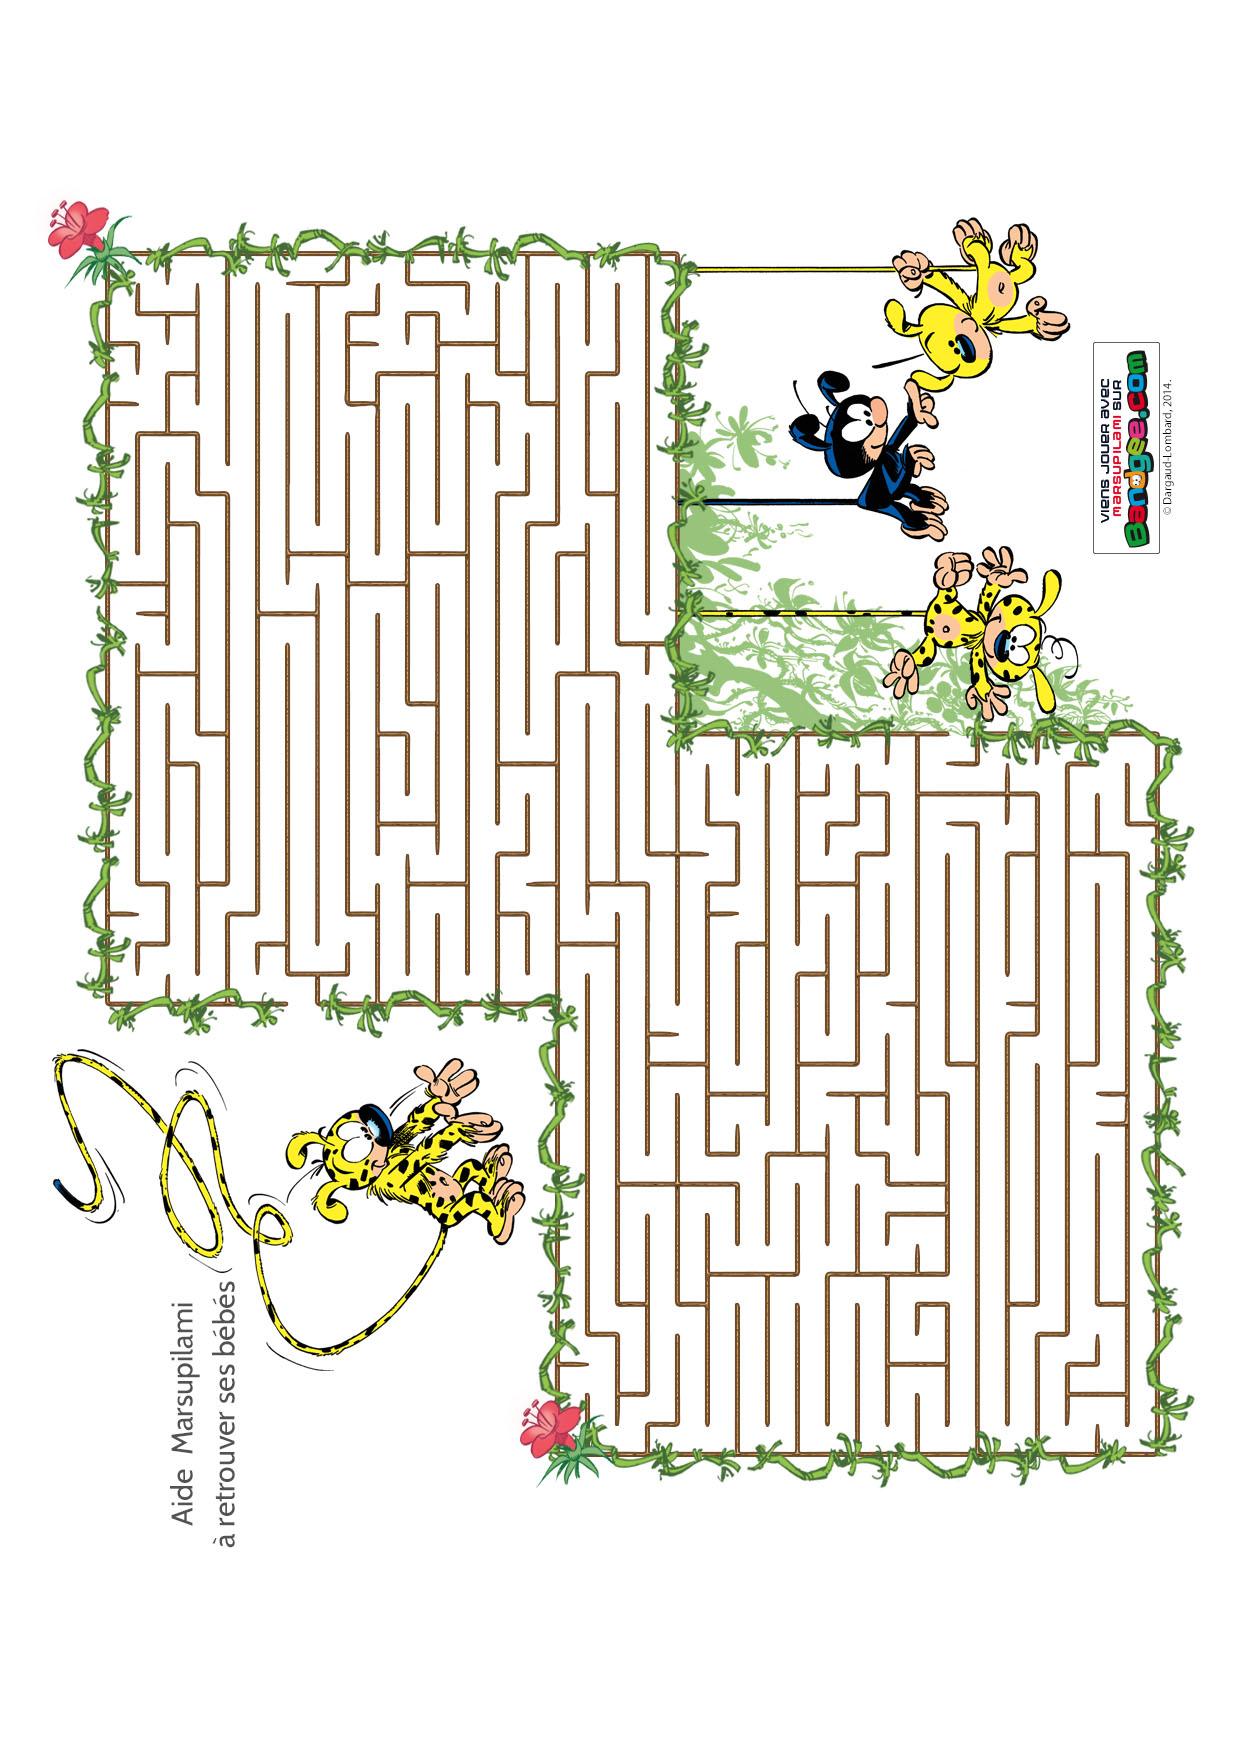 - Jeux labyrinthe a imprimer ...